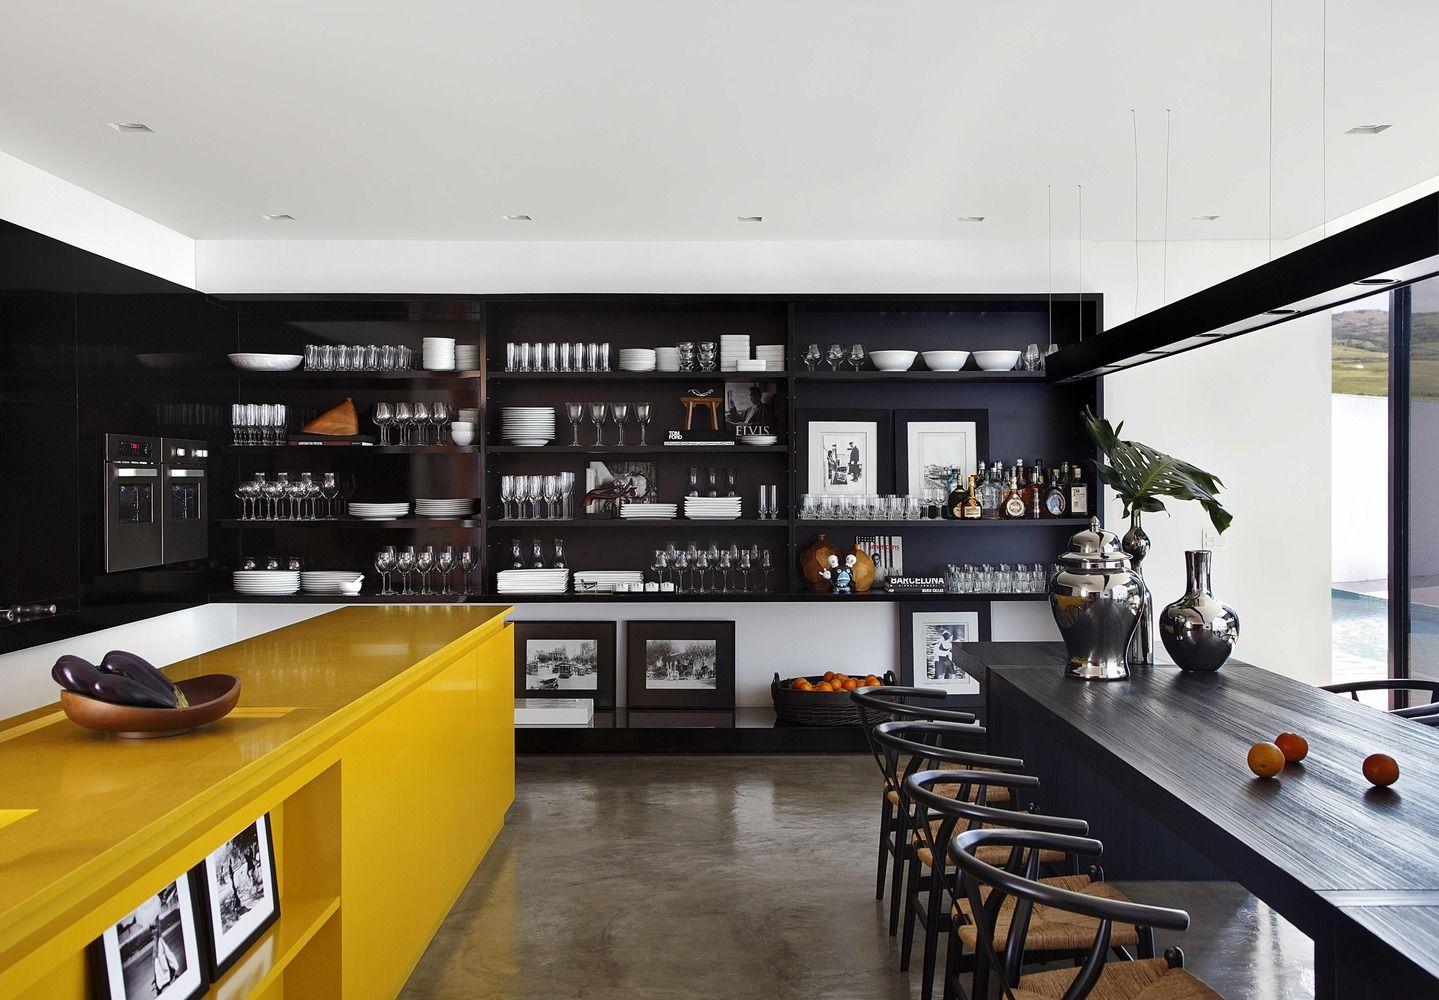 designer kuche kalea cesar arredamenti harmonischen farbtonen, galería de casa la / studio guilherme torres - 13 | studio, house, Design ideen